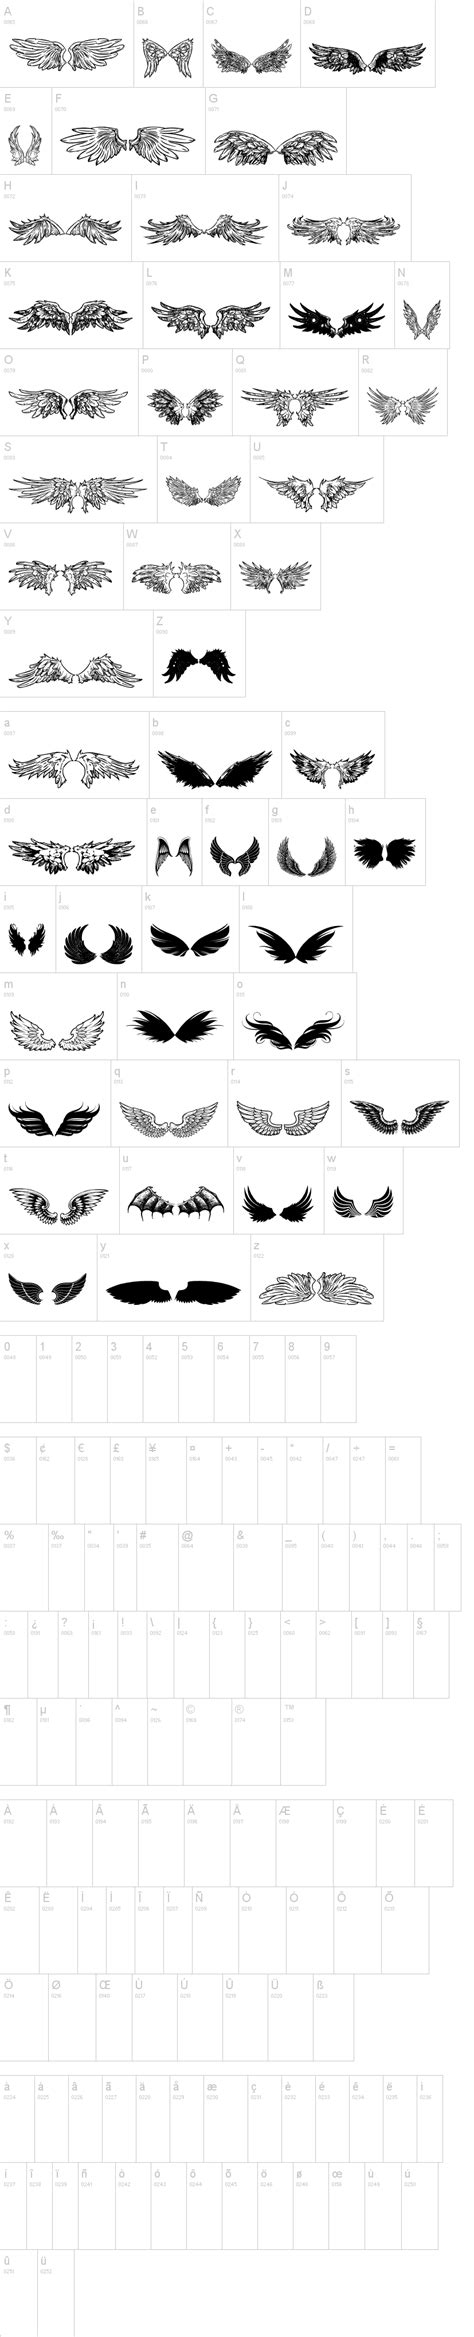 tattoo fonts dafont wings of wind tfb font dafont tipos